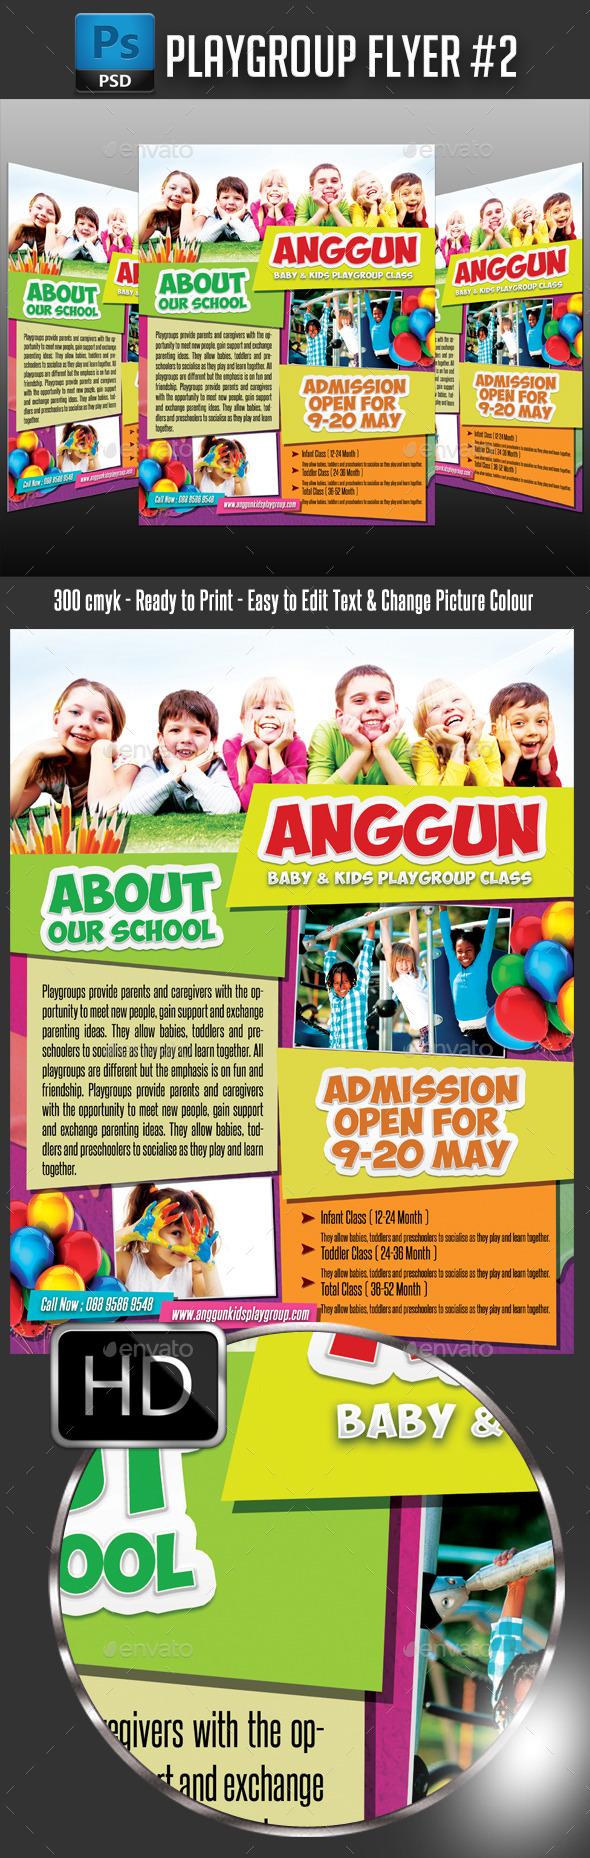 GraphicRiver Playgroup Junior School #2 11188455